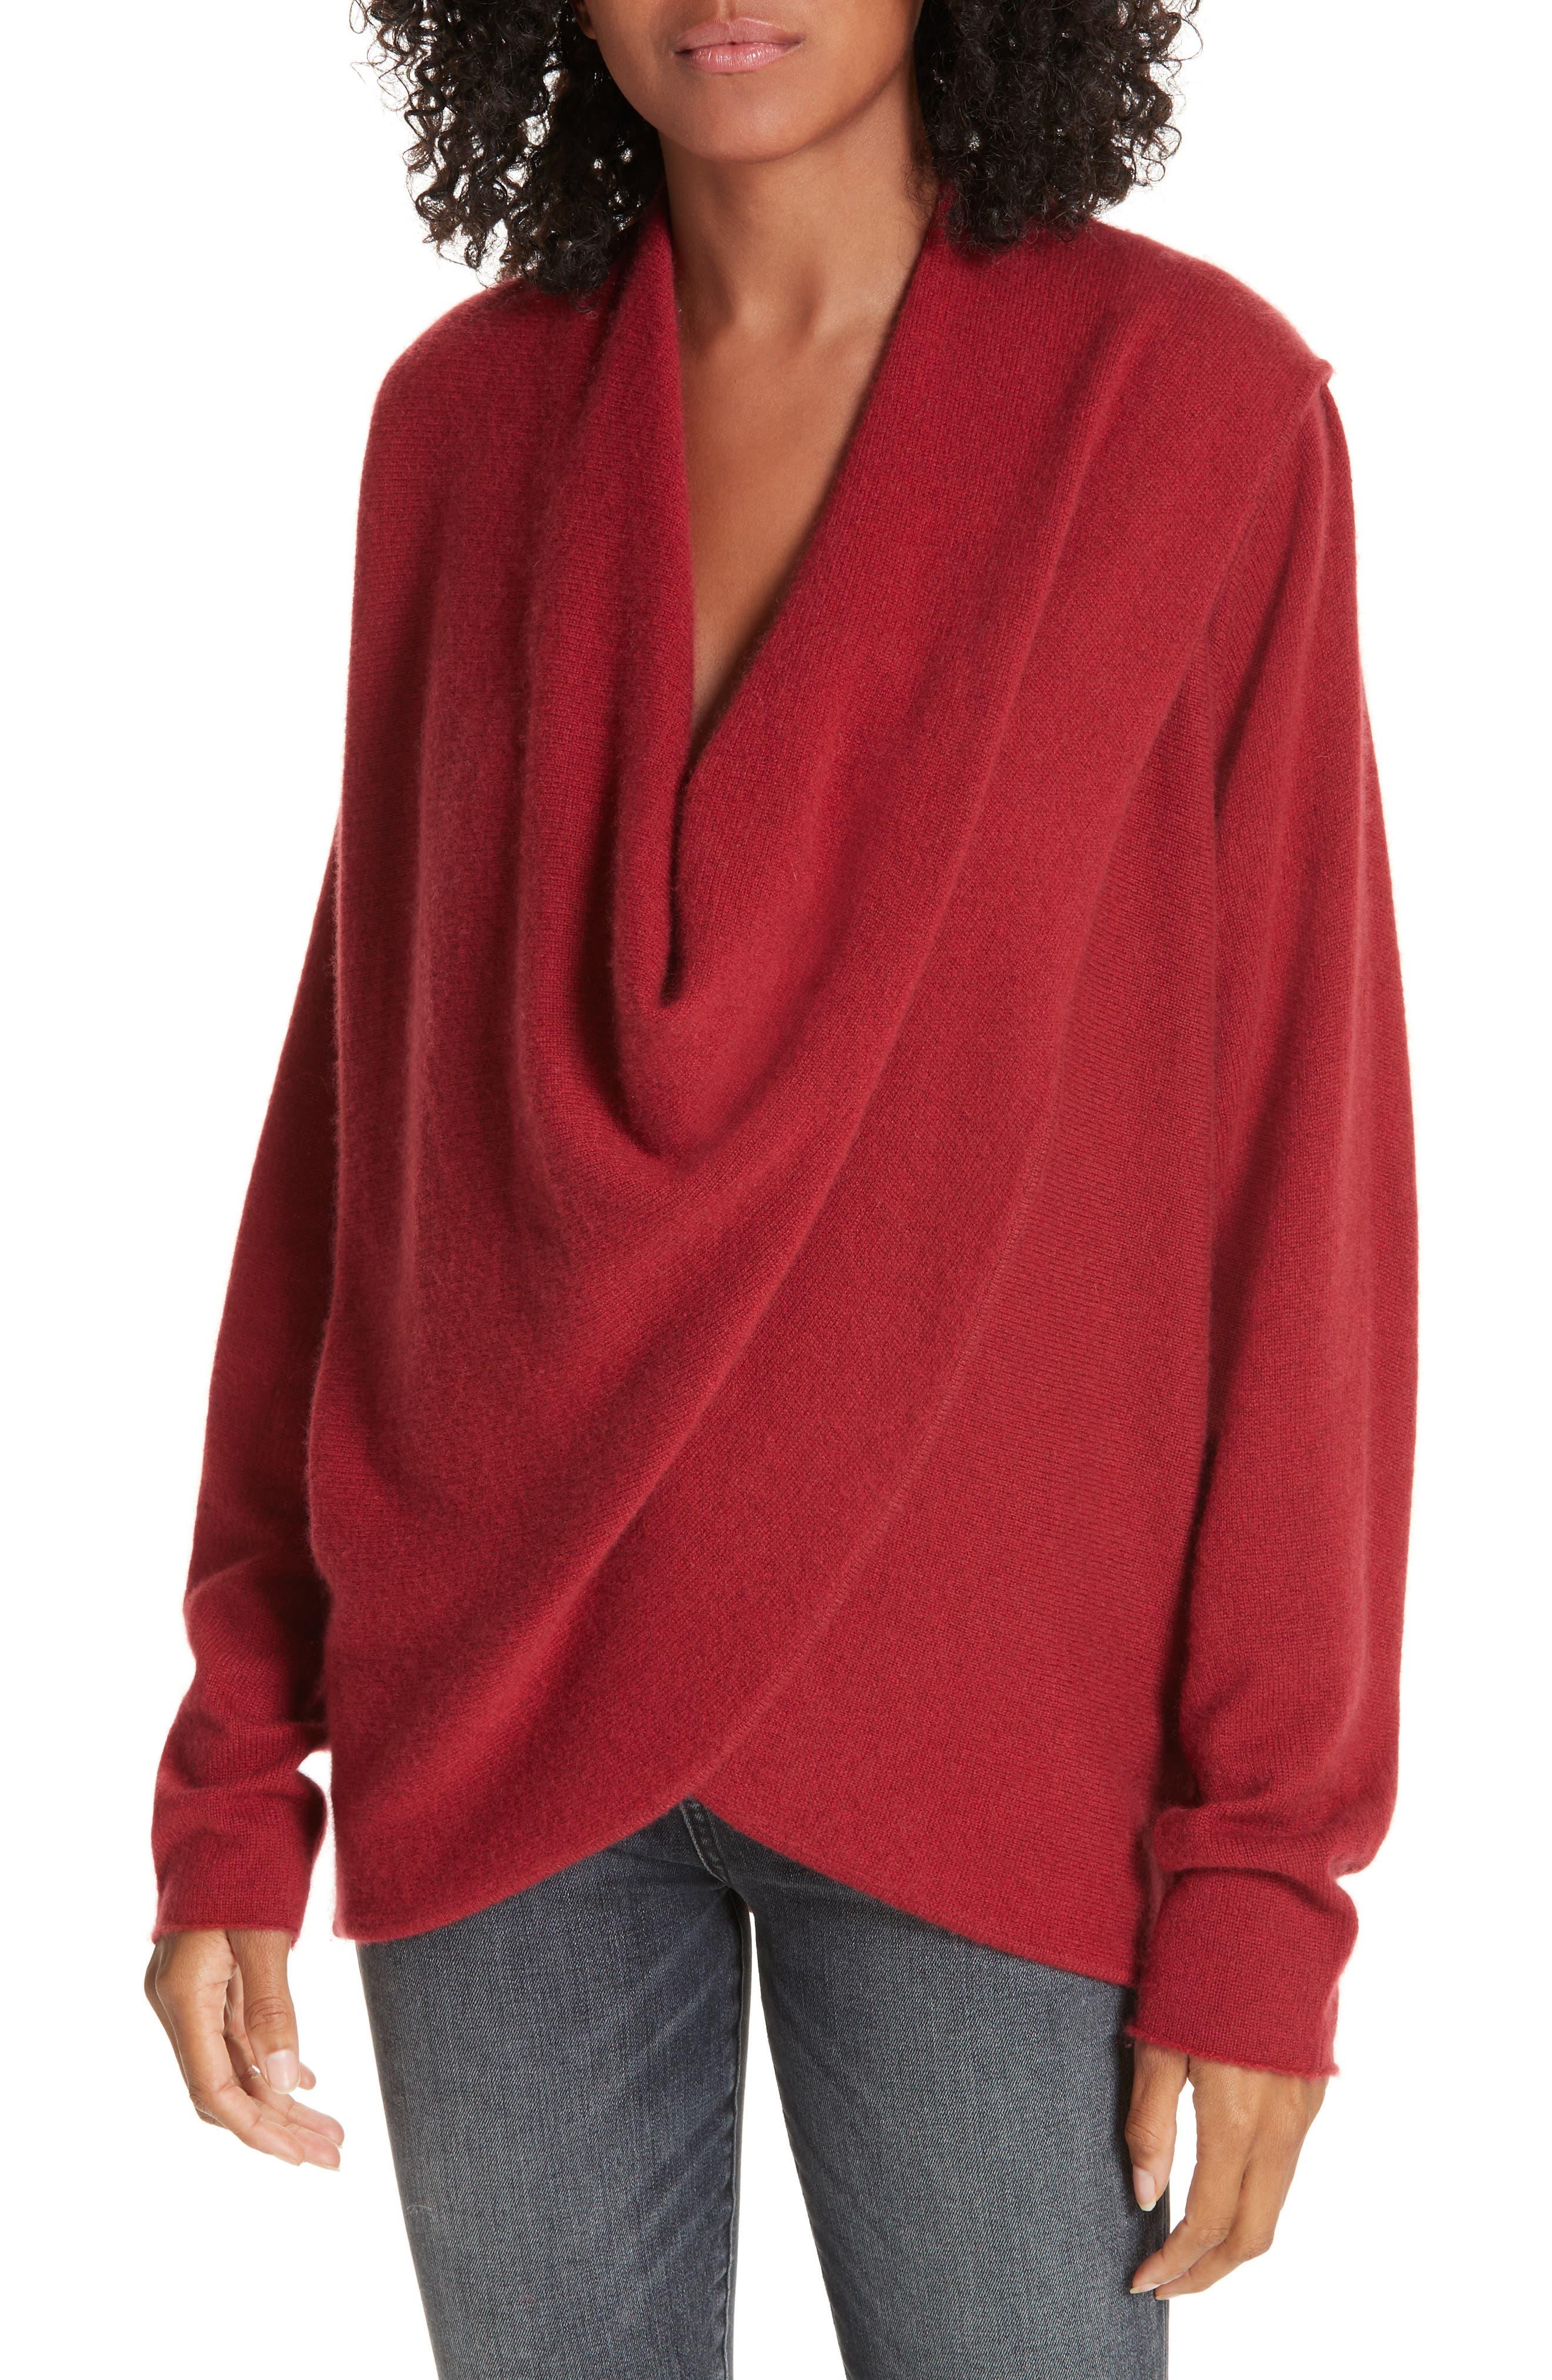 BROCHU WALKER,                             Clea Cashmere Wrap Sweater,                             Main thumbnail 1, color,                             TANGIER